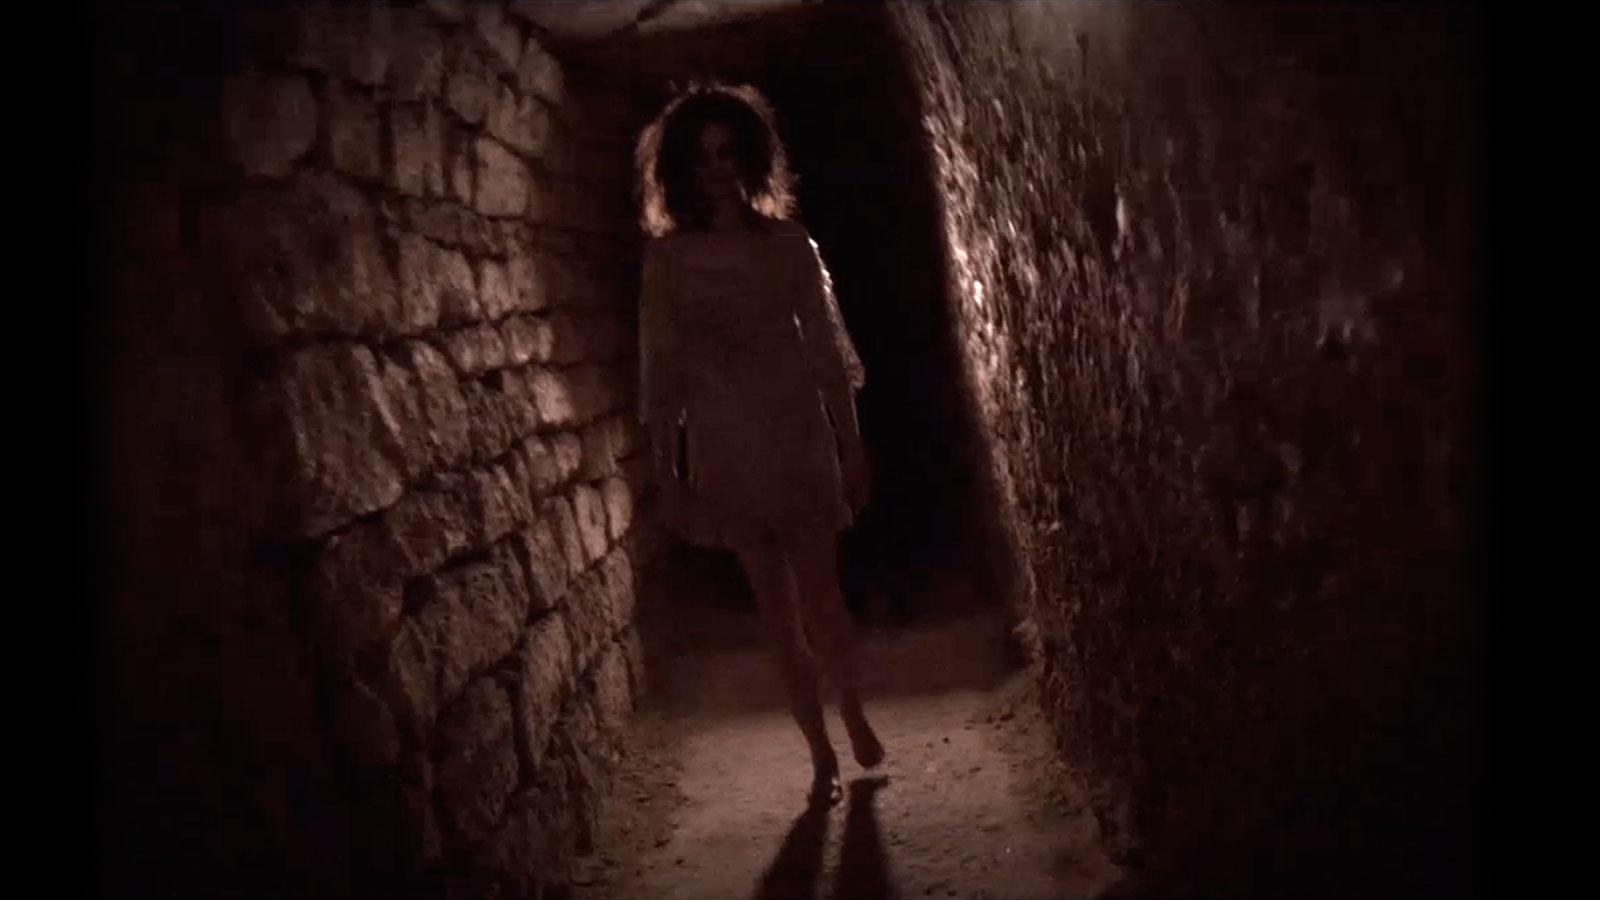 Explore the Catacombs